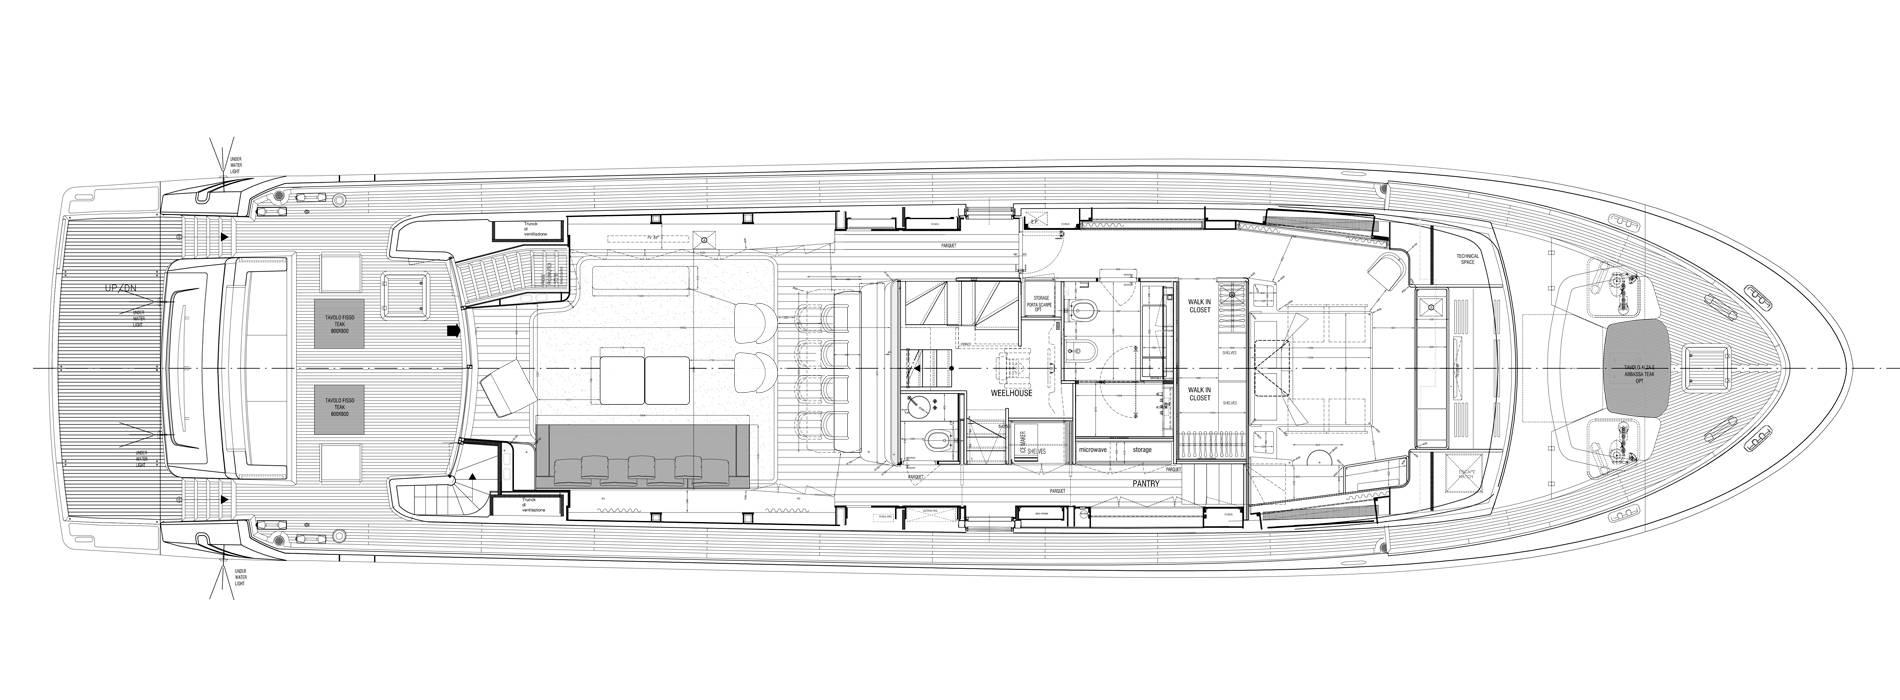 Sanlorenzo Yachts SL96-635 Главная палуба